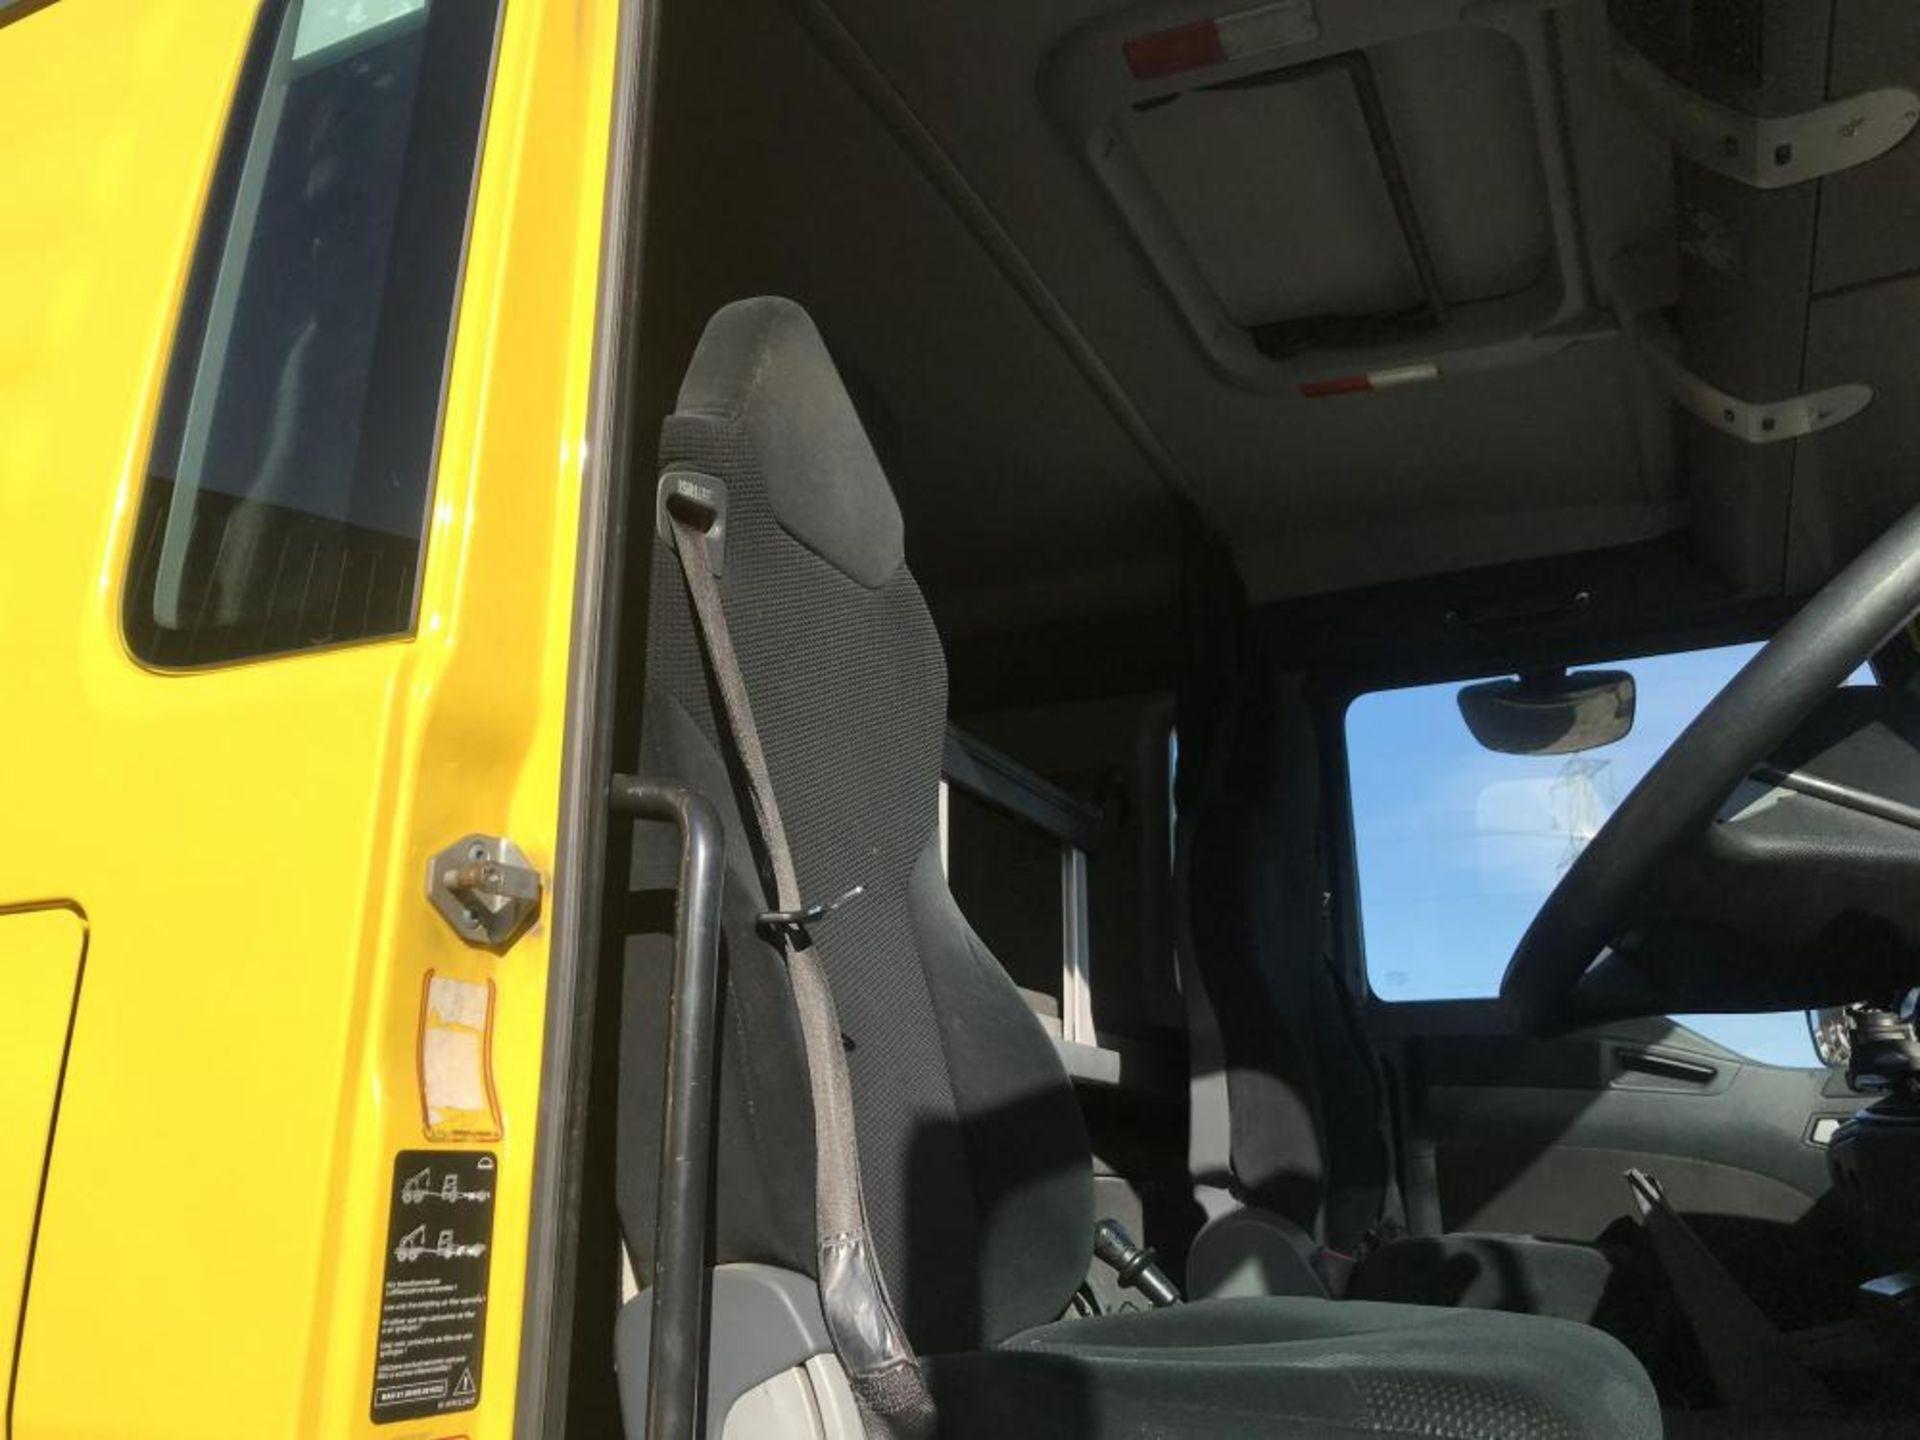 2012/12 REG MAN TG-M 18.250 4X2 LL L 6.9L DIESEL SLEEPER CAB AUTO GEARBOX GOOD CONDITION *PLUS VAT* - Image 5 of 15